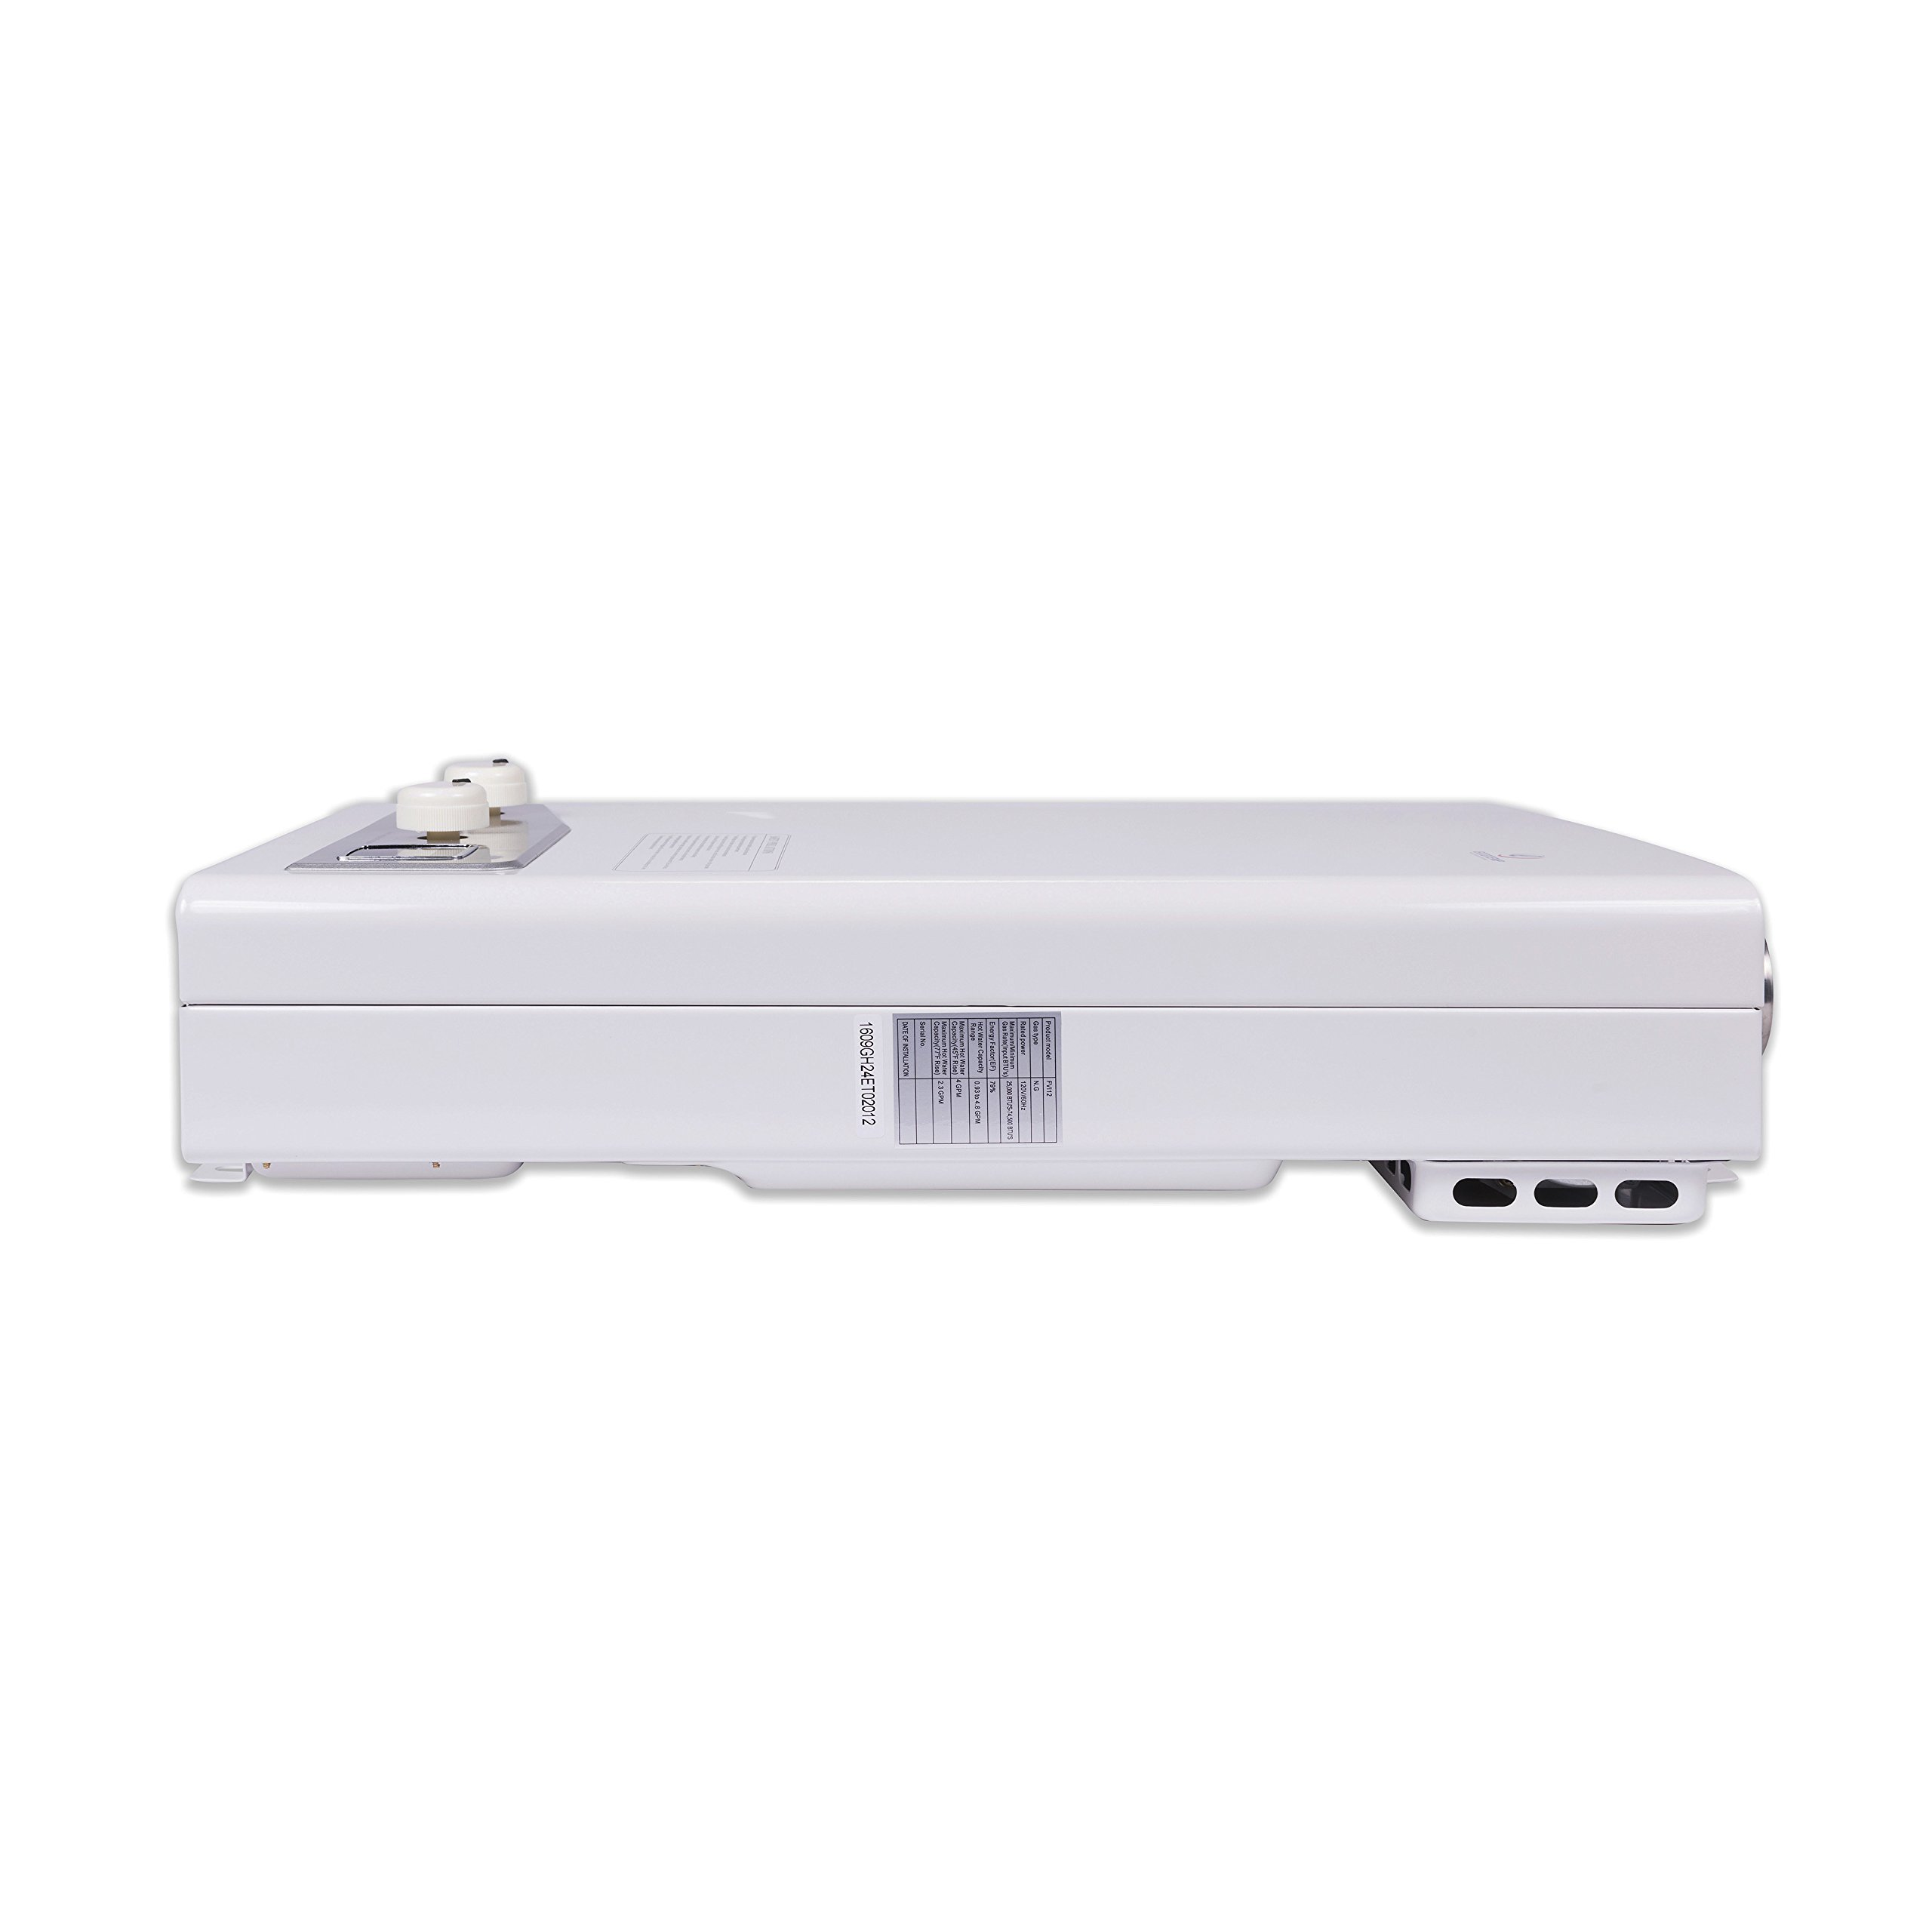 Eccotemp fvi12-NG FVI-12 Natural Gas, 3.5 GPM, High Capacity Tankless Water Heater, White by Eccotemp (Image #5)